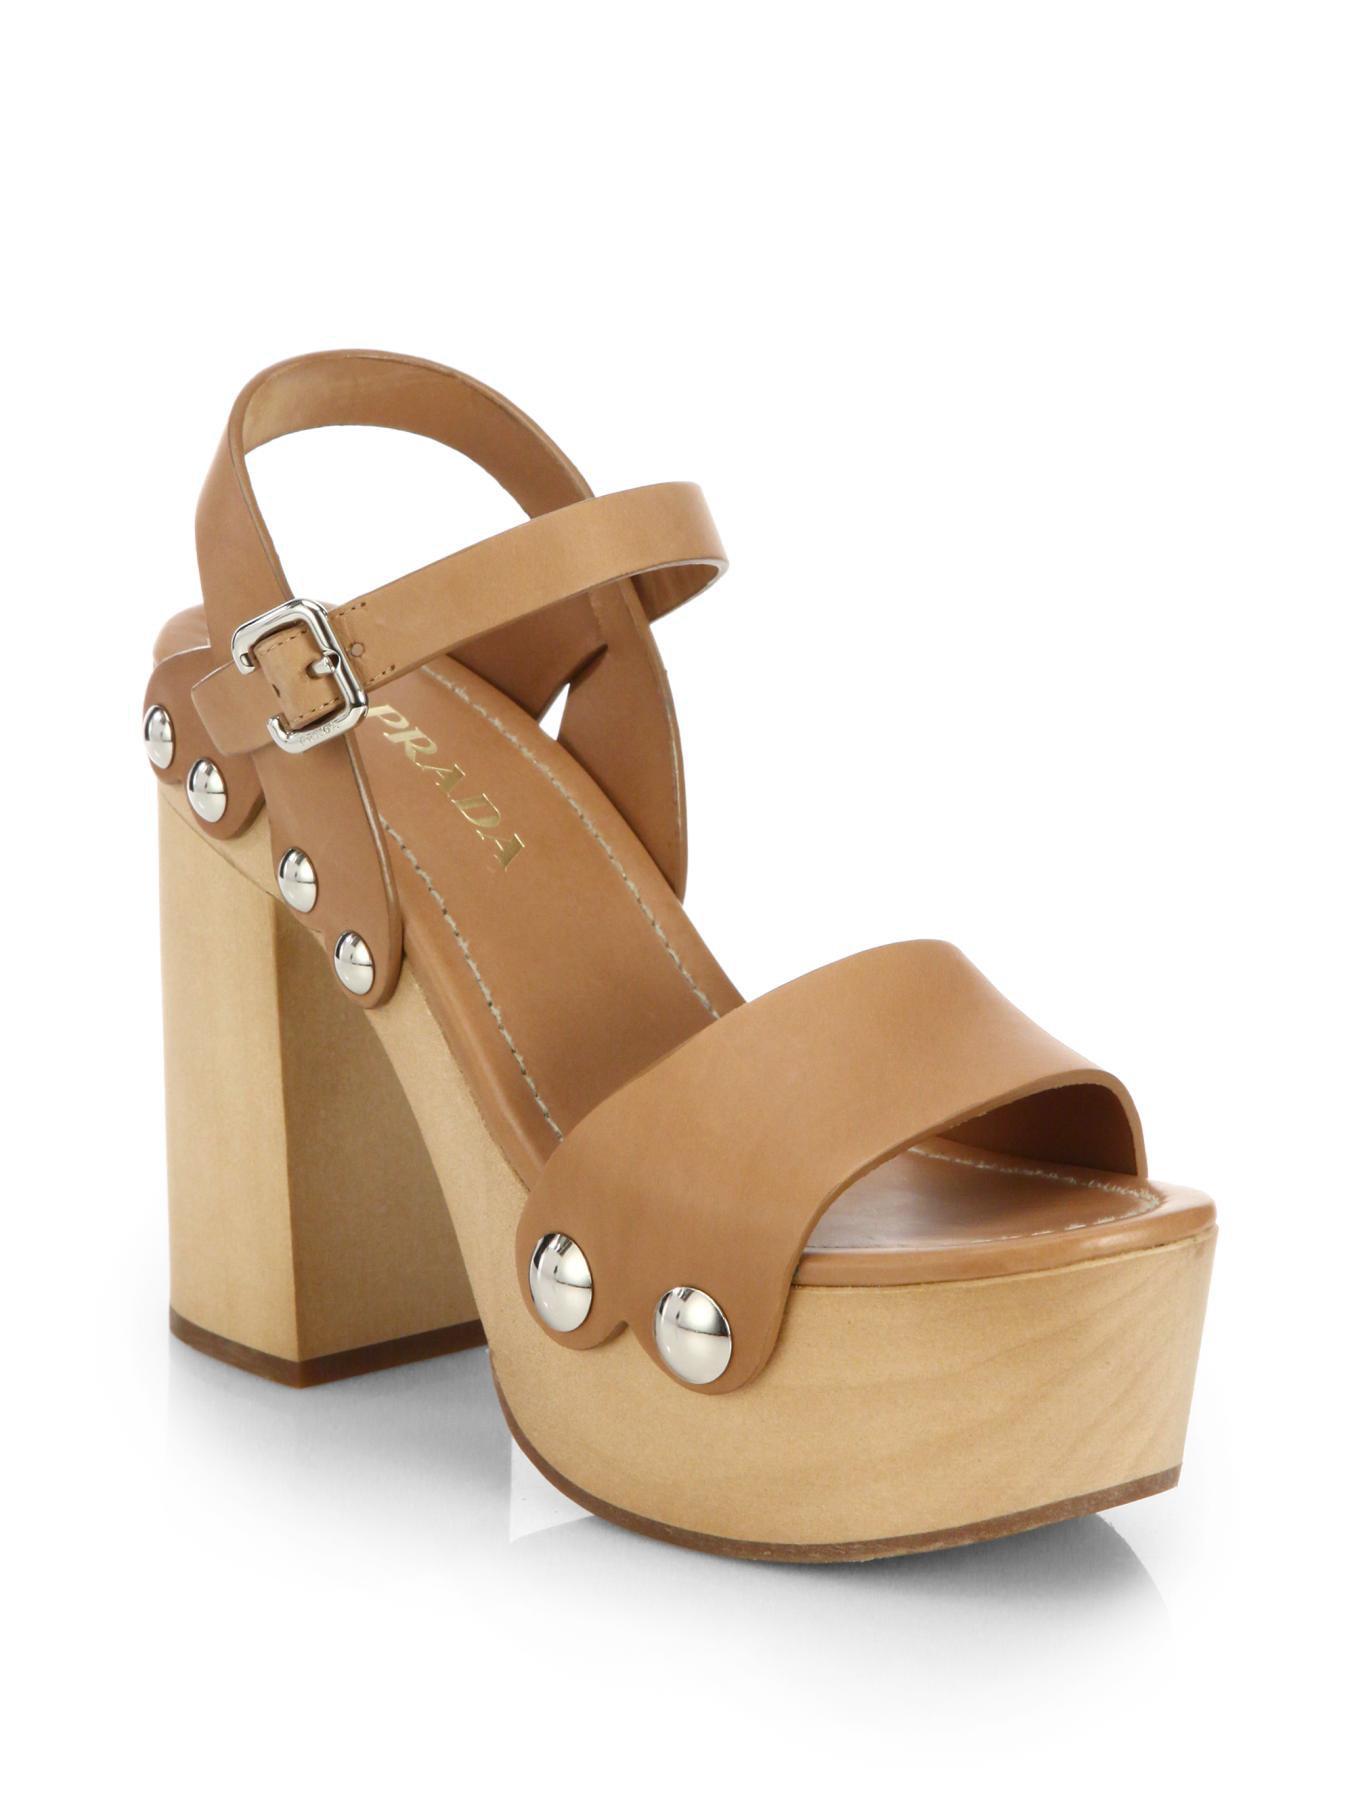 51eab47a734 Lyst - Prada Wooden-heel Leather Platform Sandals in Brown